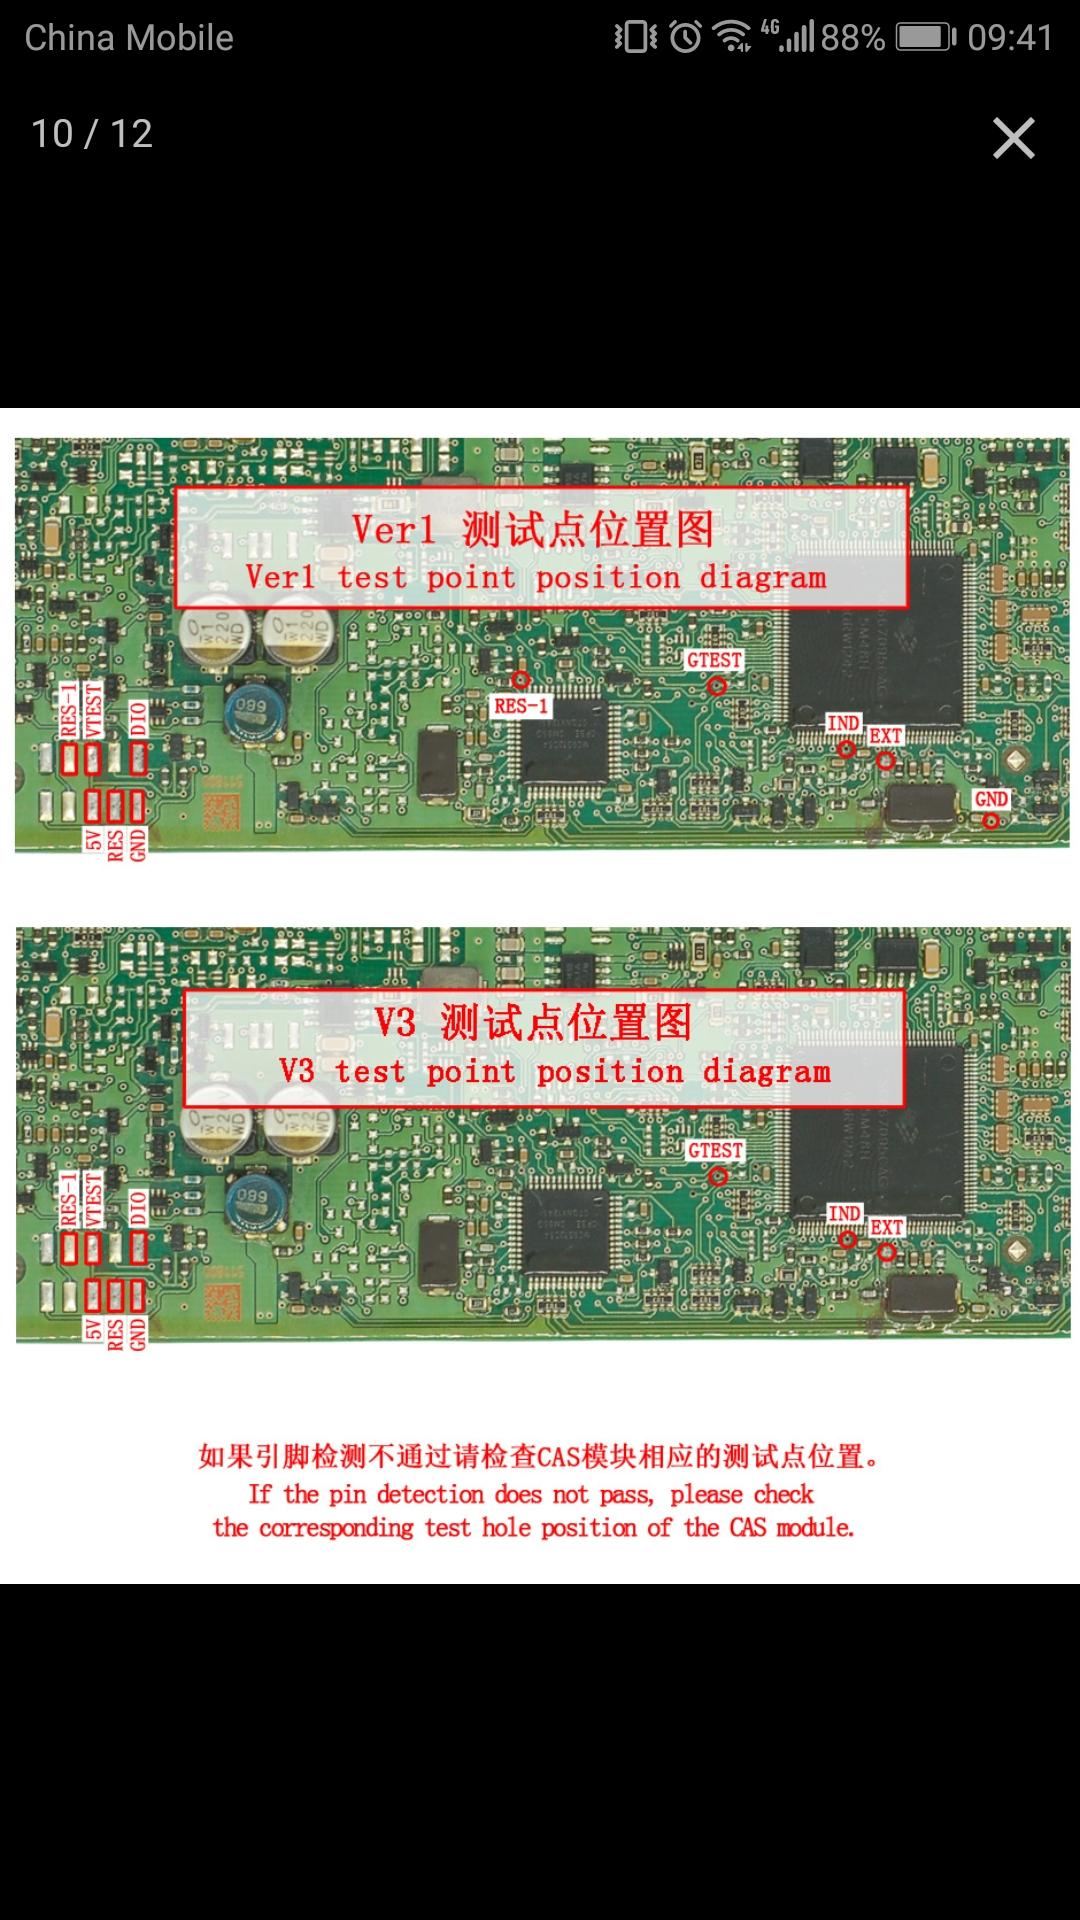 acdp-mini-bmw-cas4-newest-wiring-diagram-02